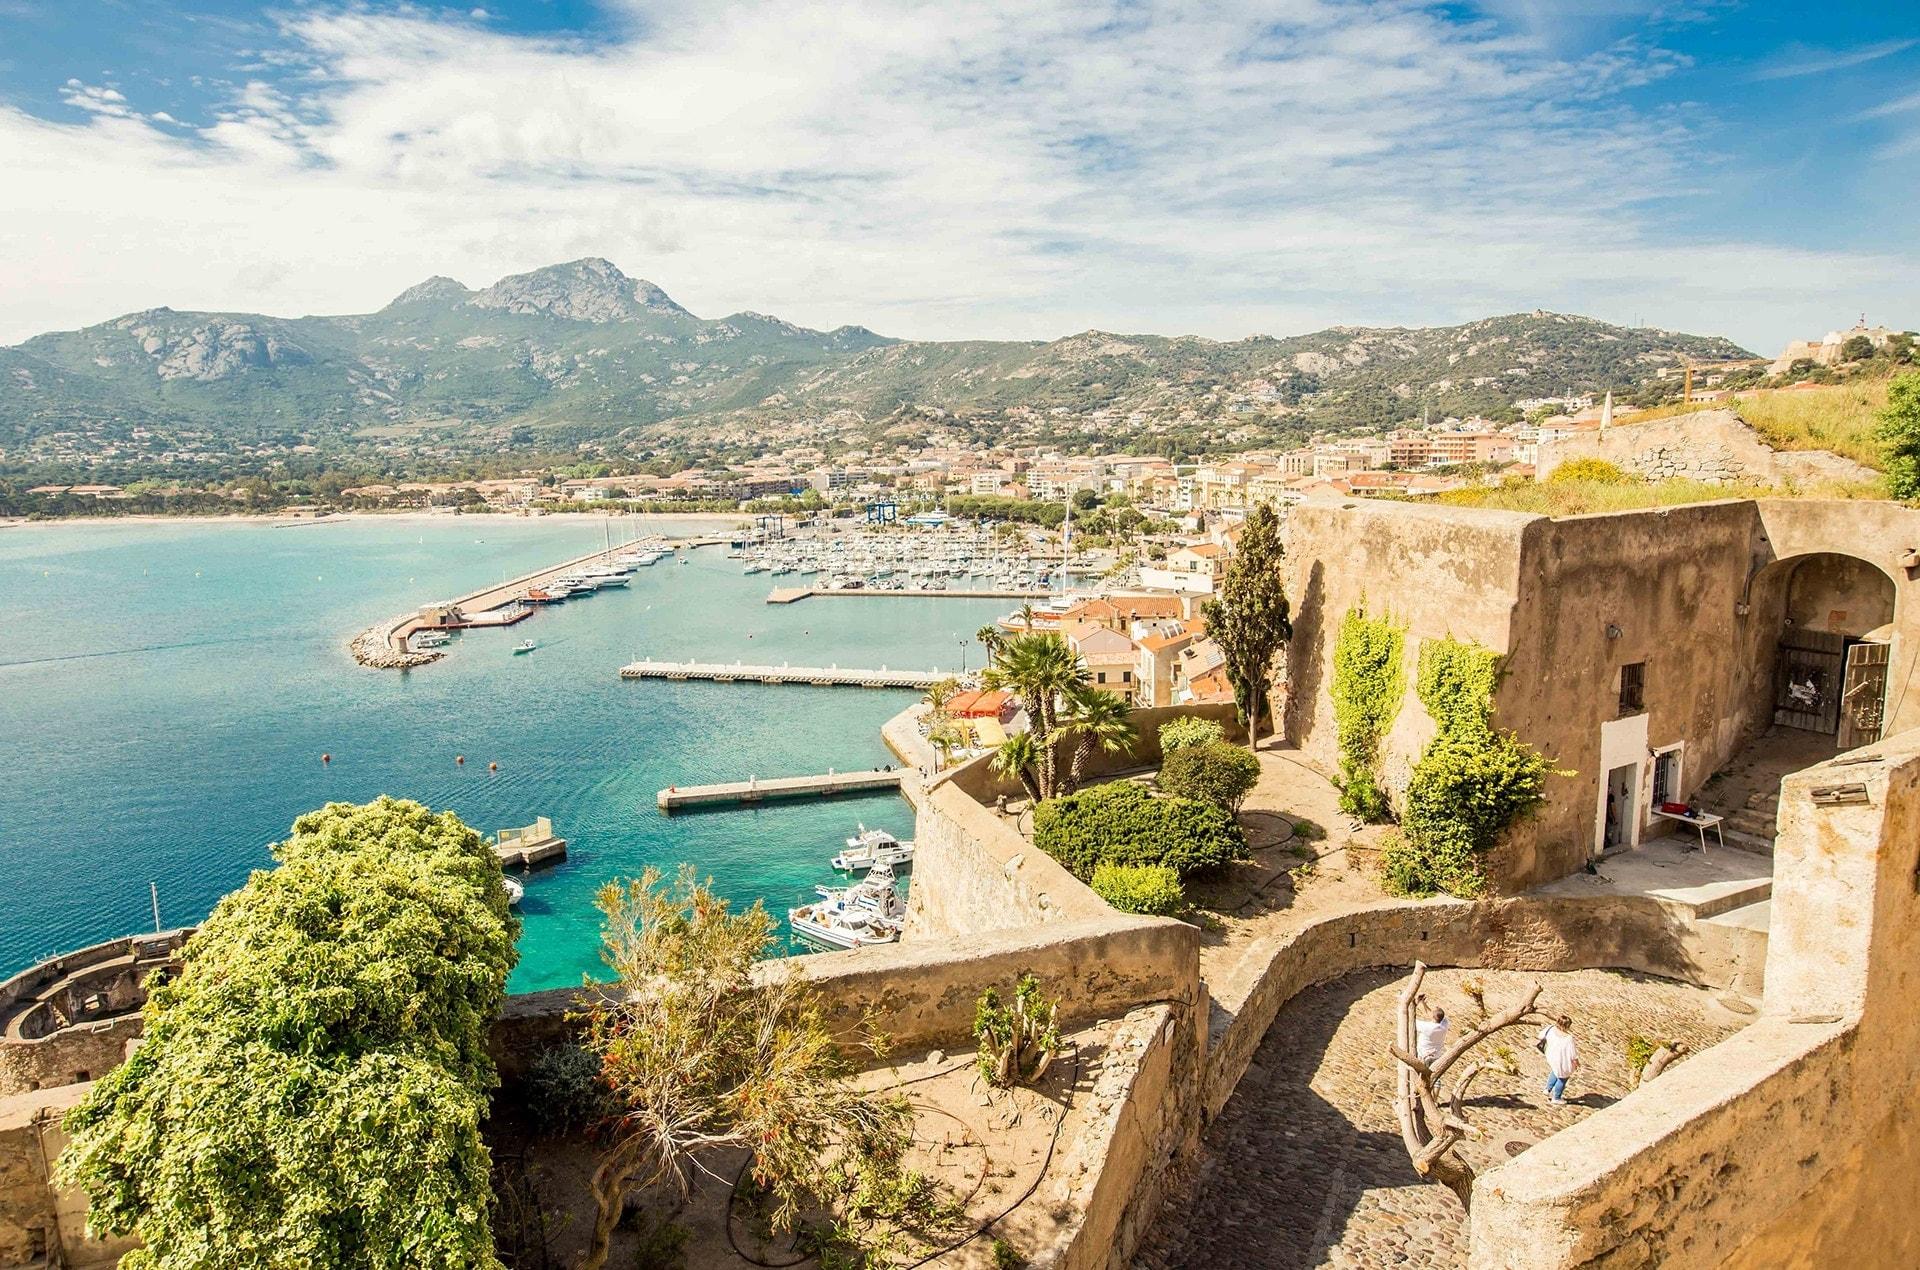 blog-voyage-sabine-kley-corse-balagne-calvi-remparts